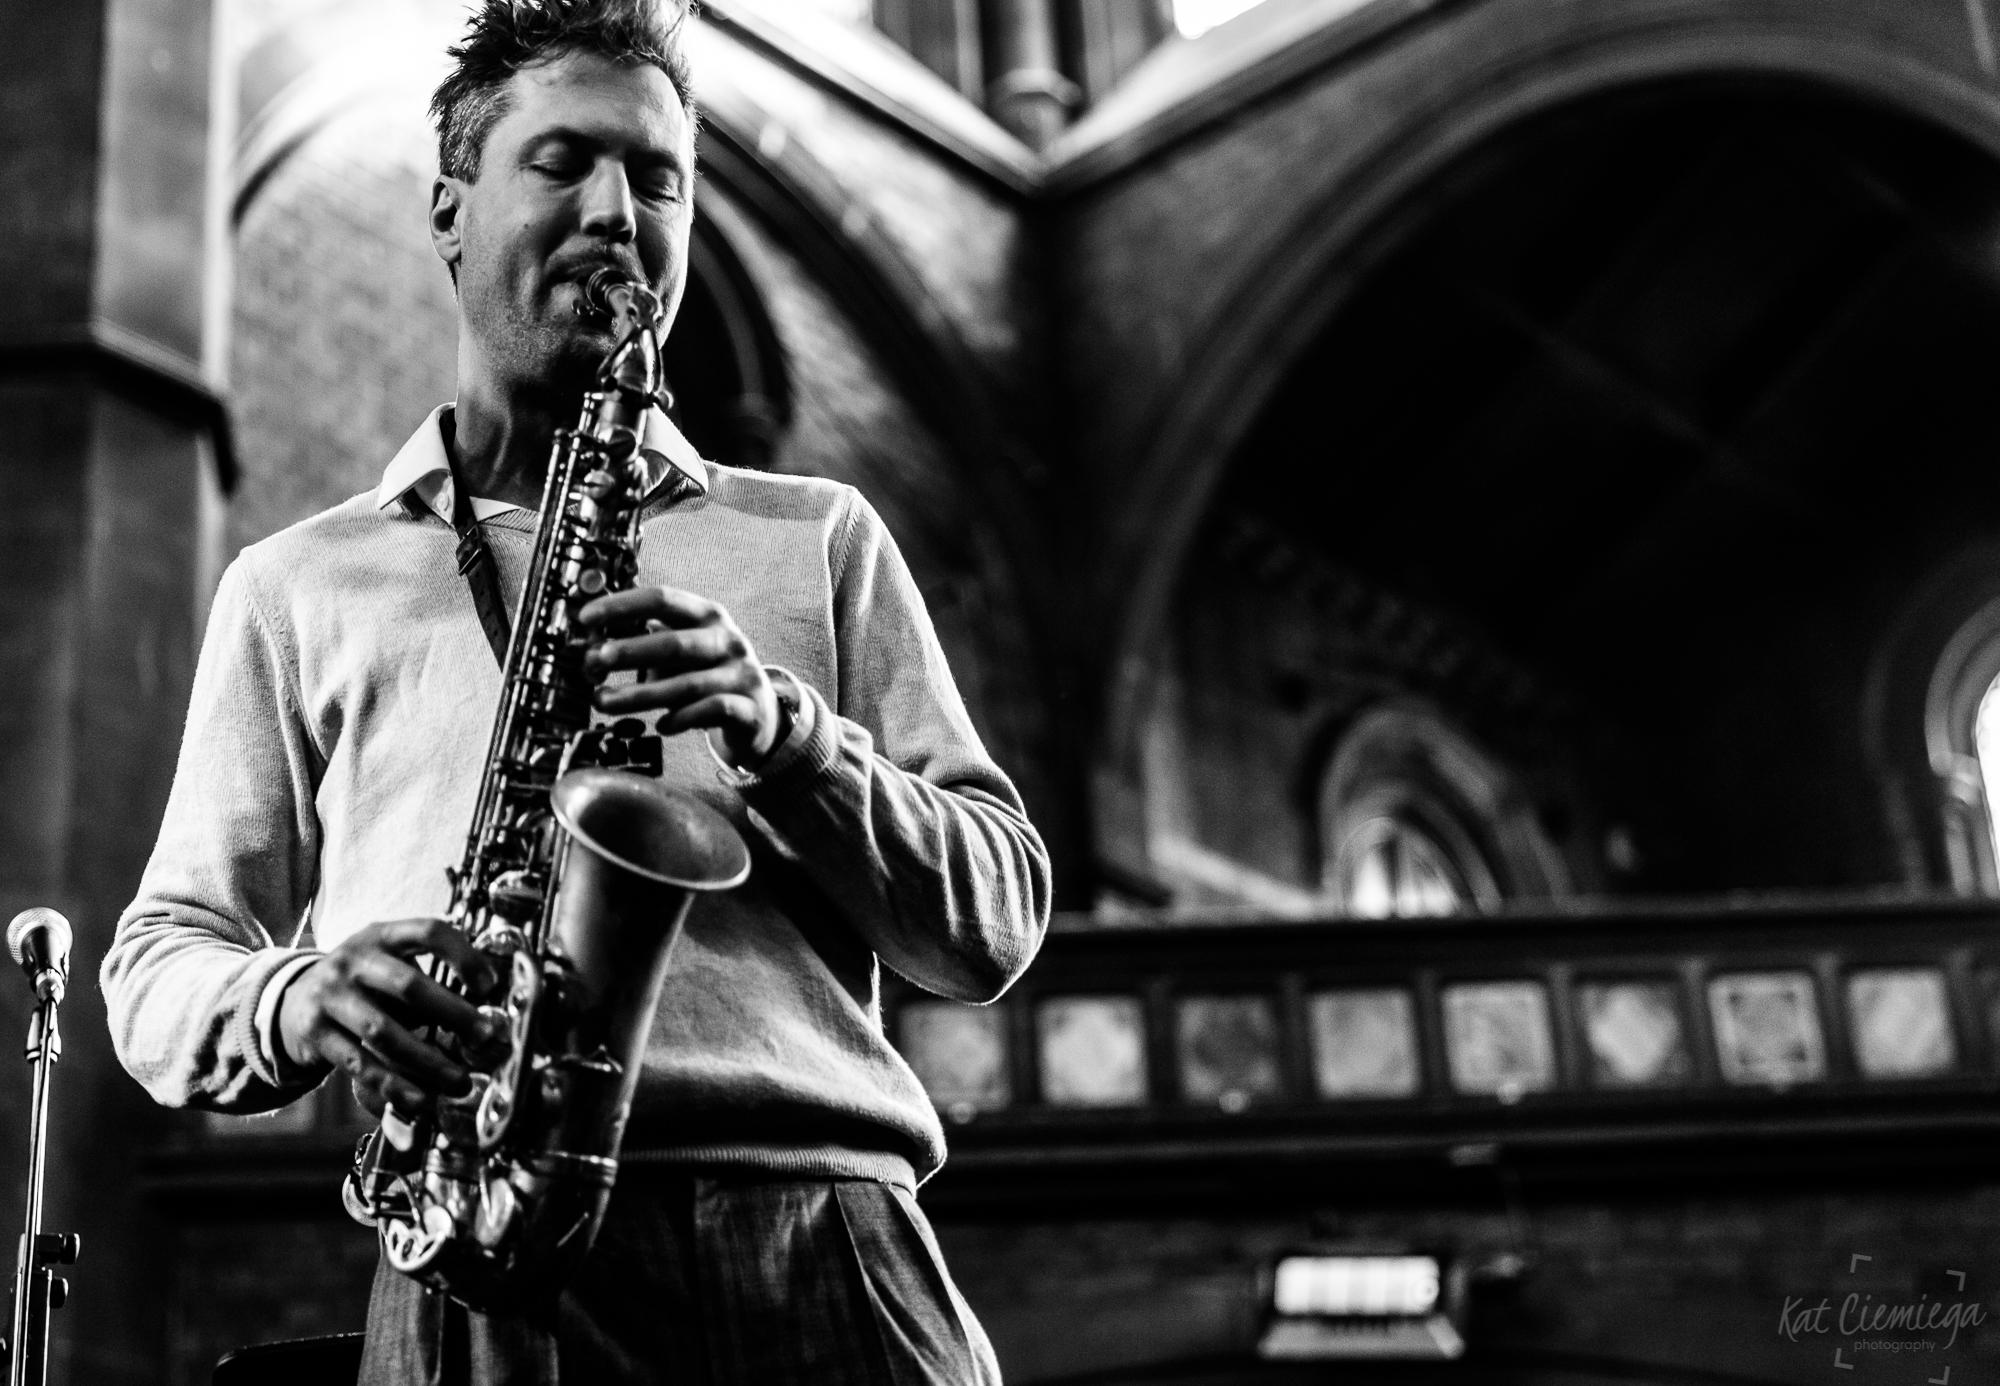 Kat Ciemiega Photography, Daylight Music, Guido Spannocchi, concert photographer, event photographer, live music, photographer London, music London, saxophone